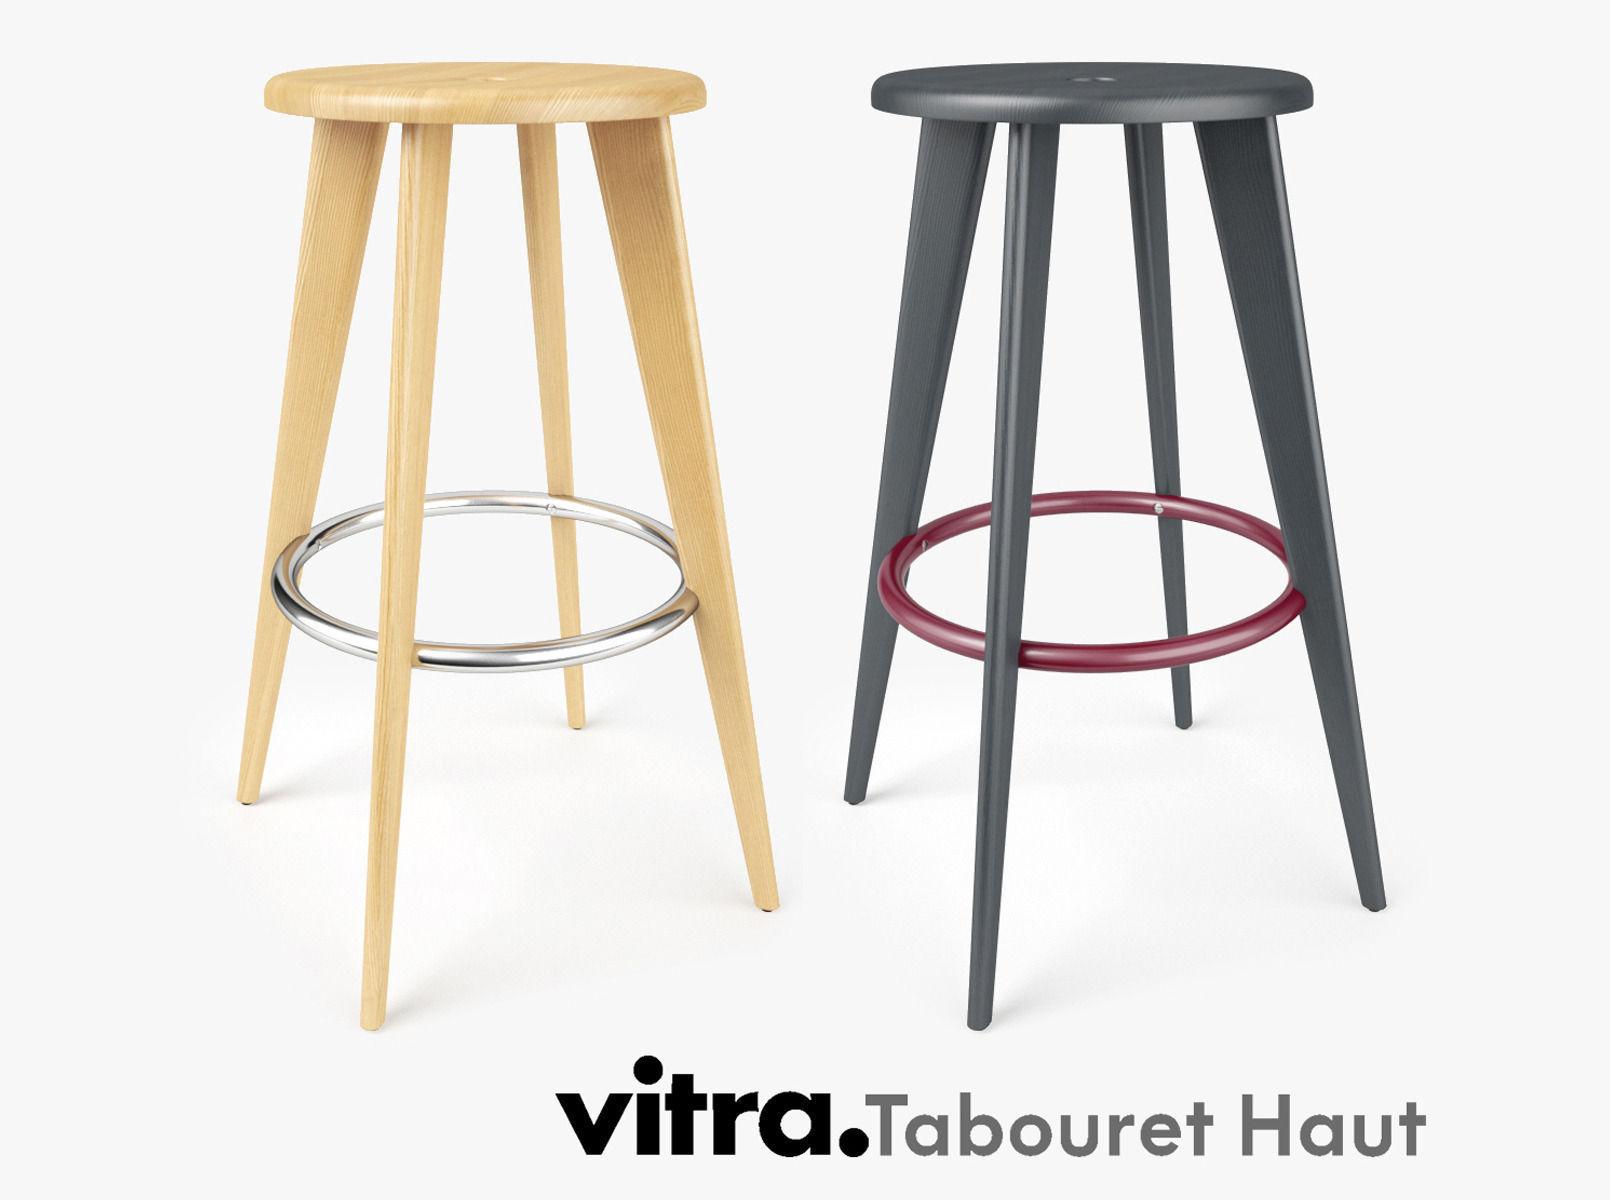 3dCgtrader Haut Bar Vitra Tabouret Stool CoBerdx